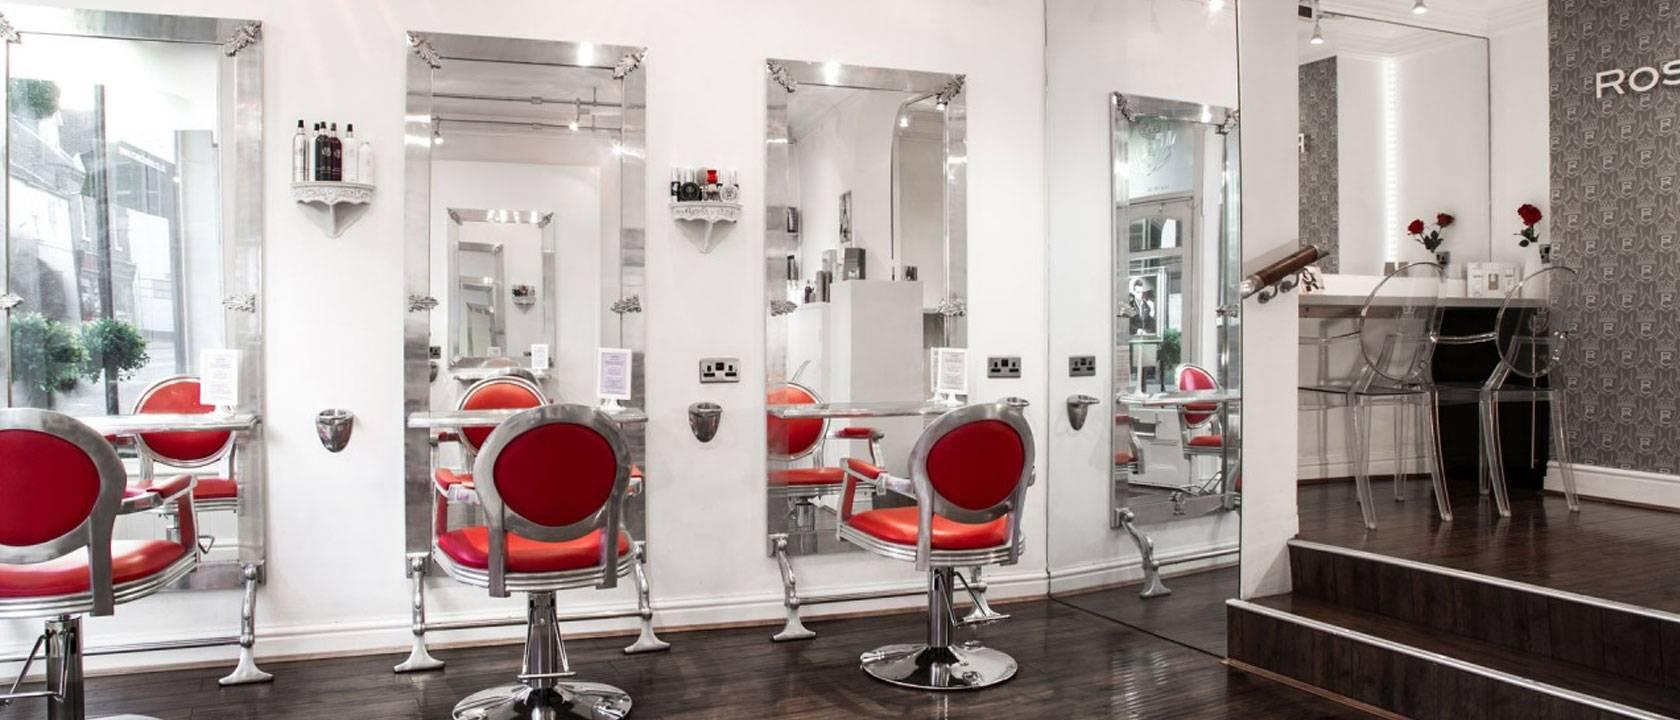 Permalink to:Beauty Salon